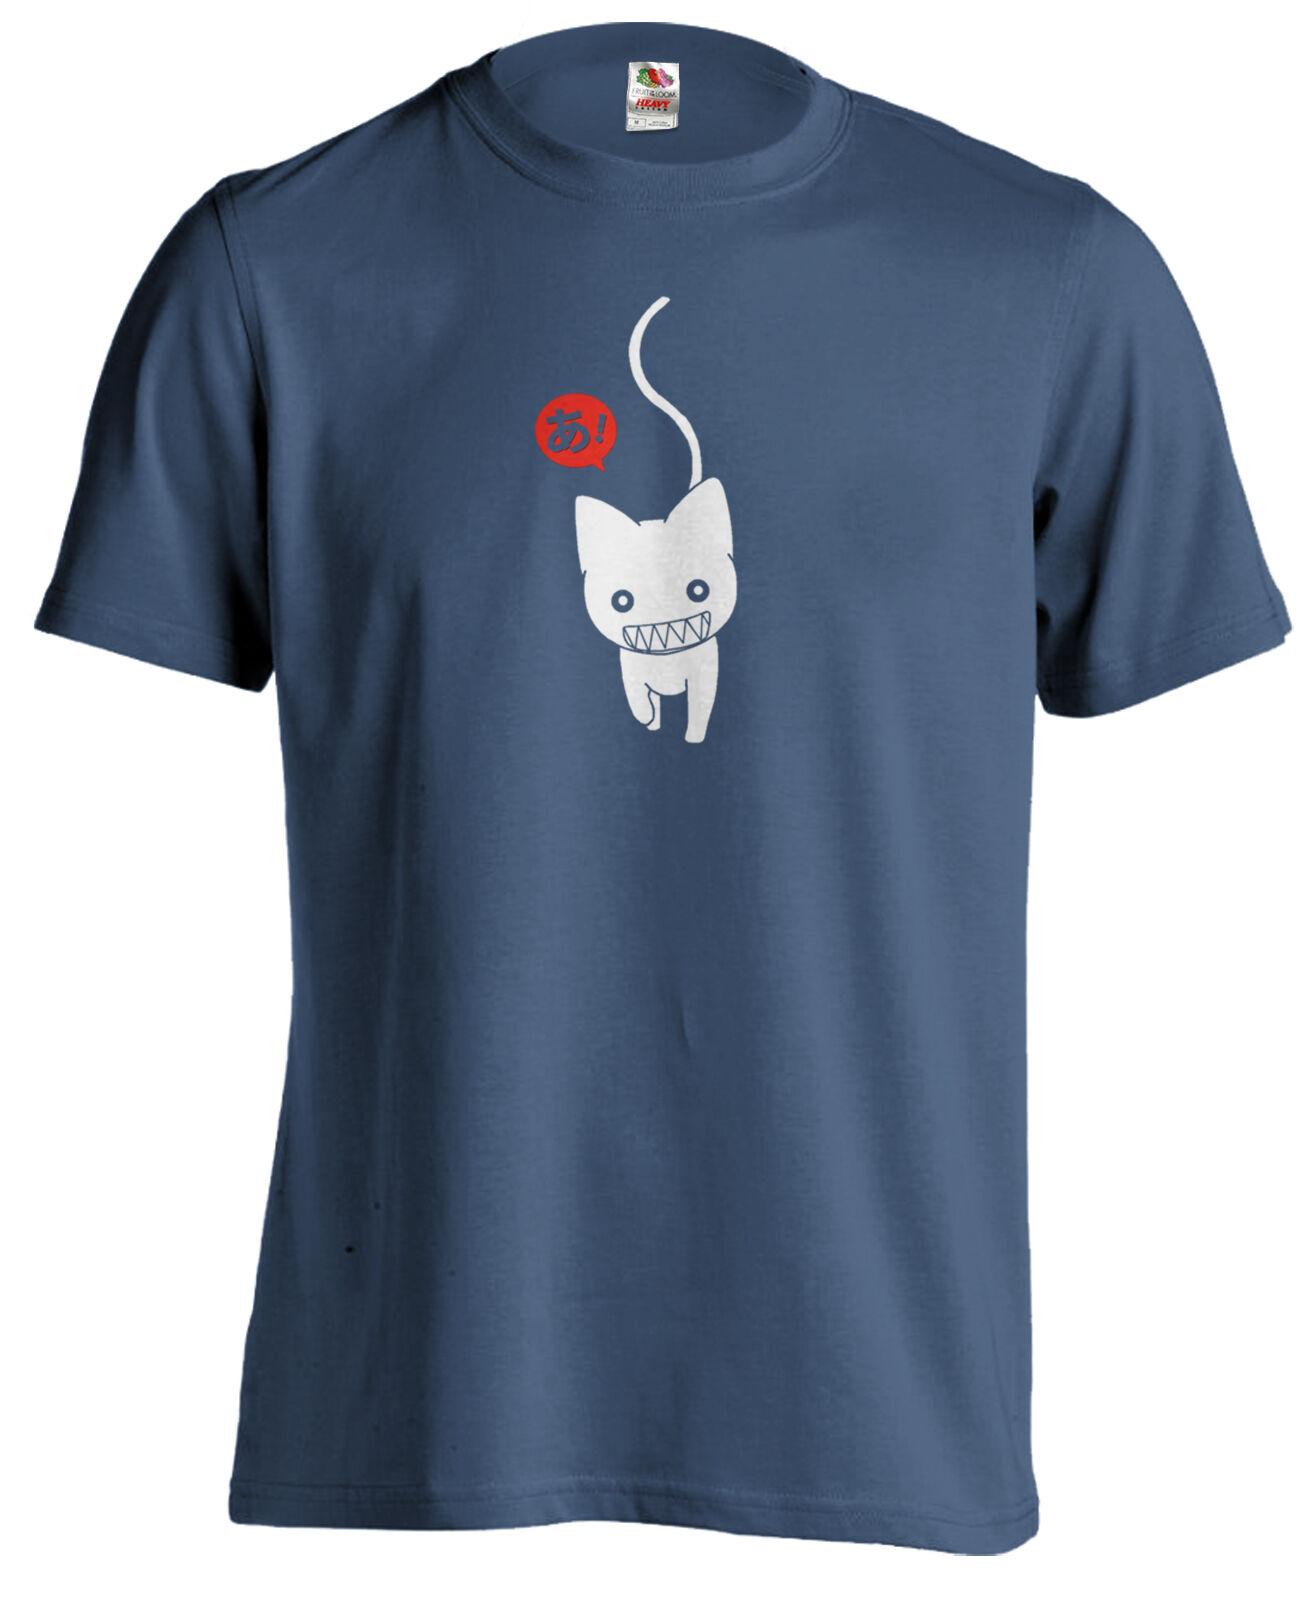 Azumanga les Daioh TEE-MANGA T-shirt - anime les Azumanga chats japonais-Tshirt T NEUF bfd4f1